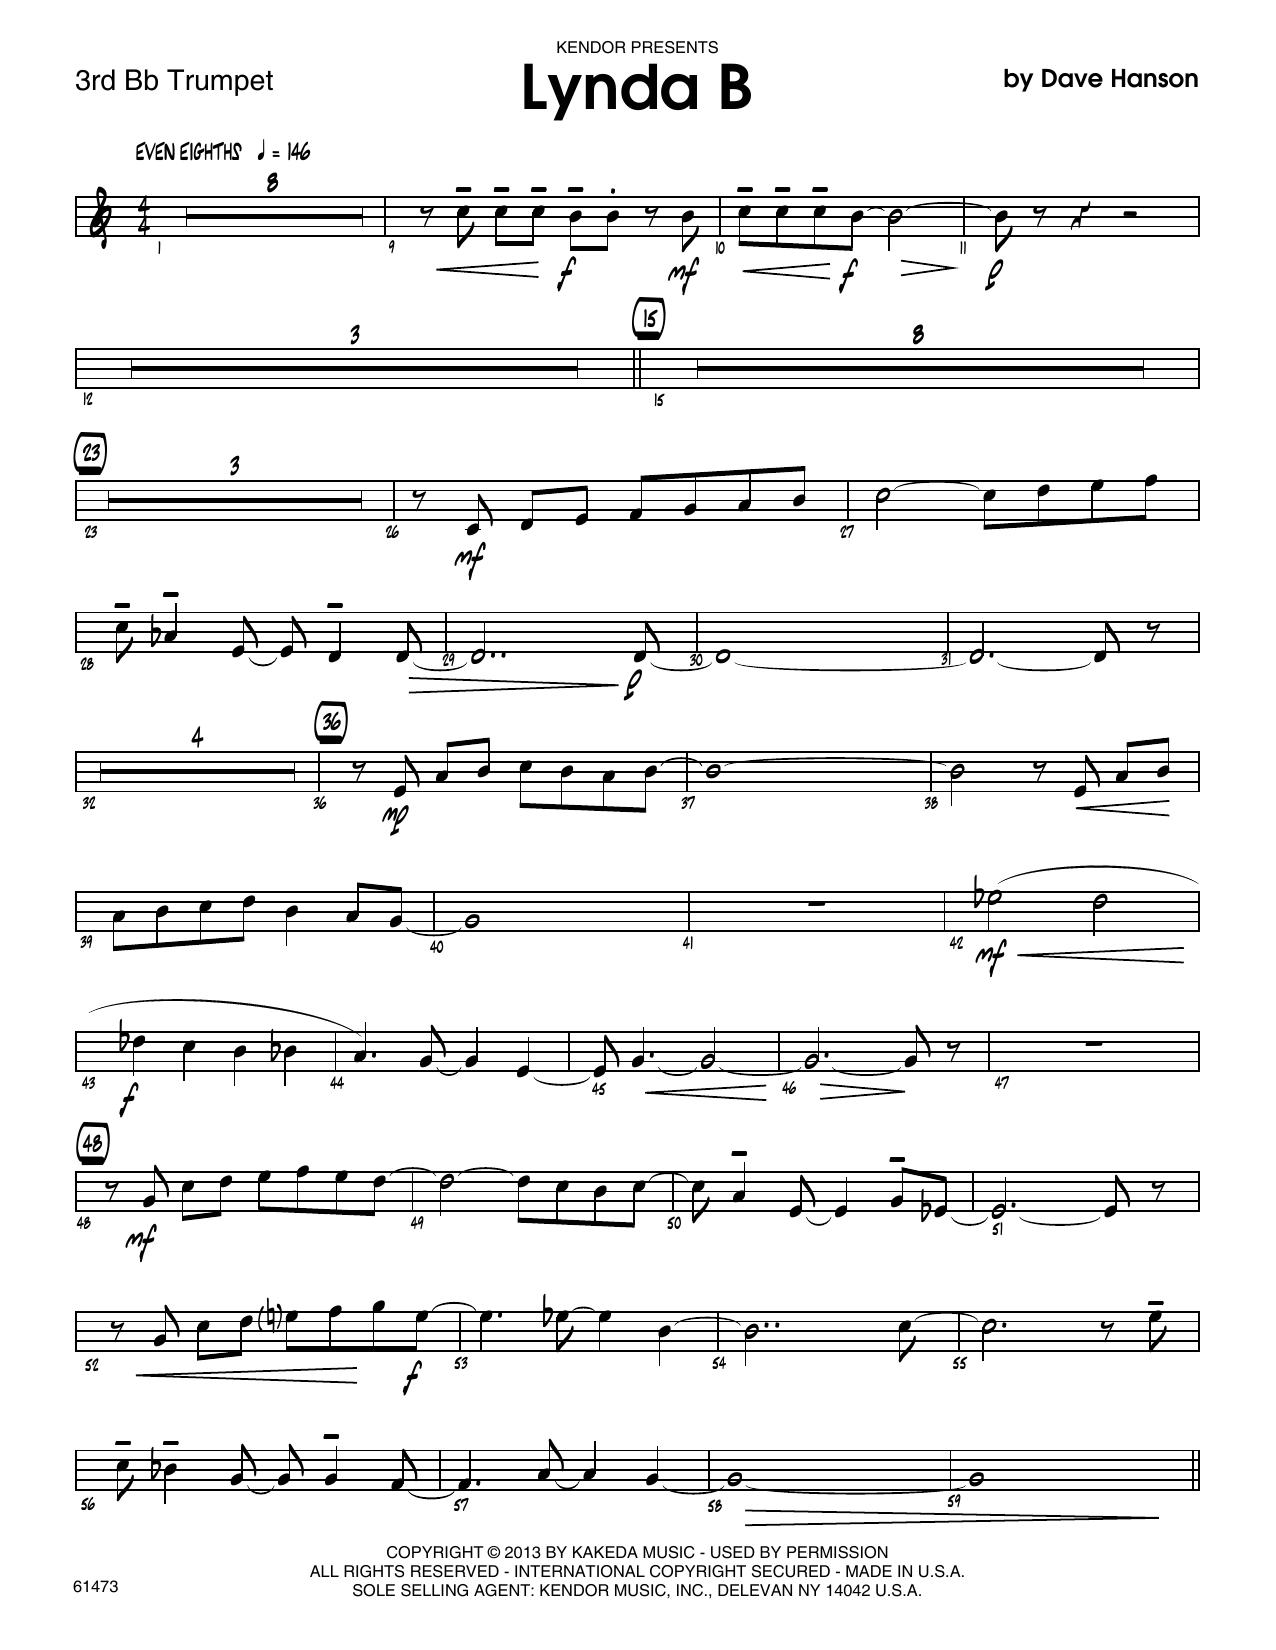 Lynda B - 3rd Bb Trumpet Sheet Music